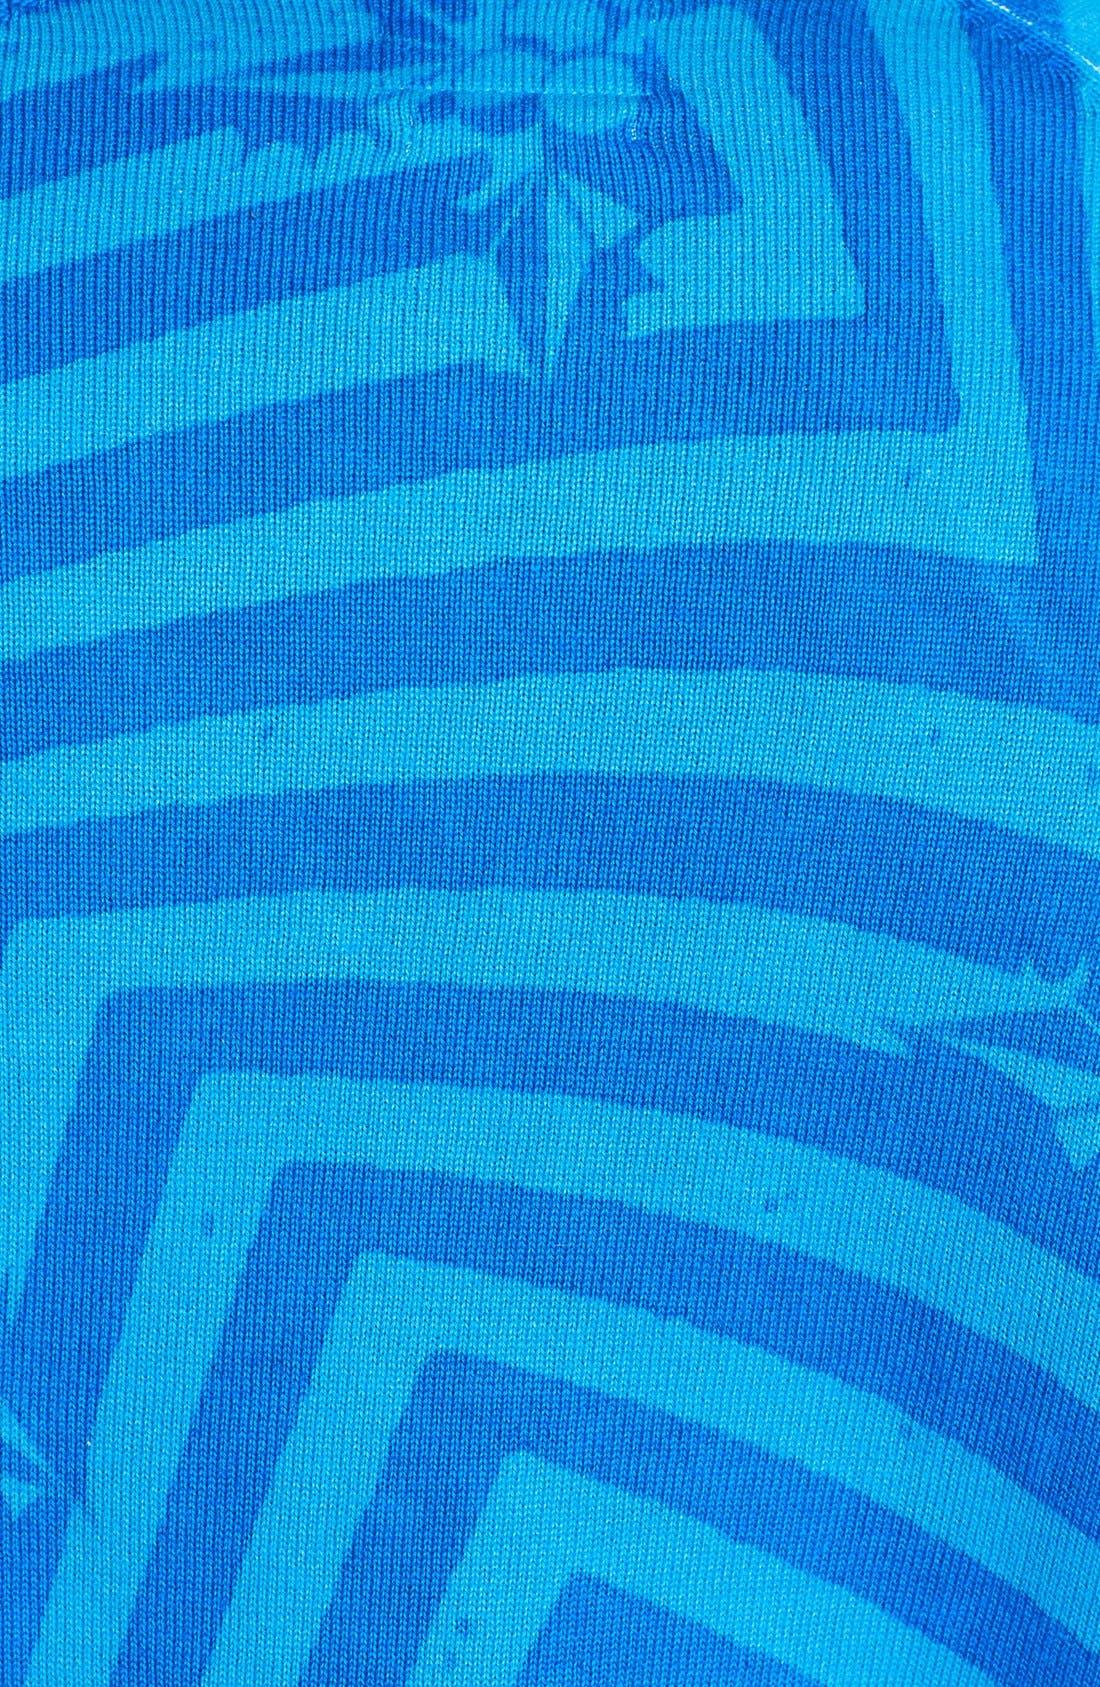 Alternate Image 3  - Volcom 'Knogger' Print Crewneck Sweater